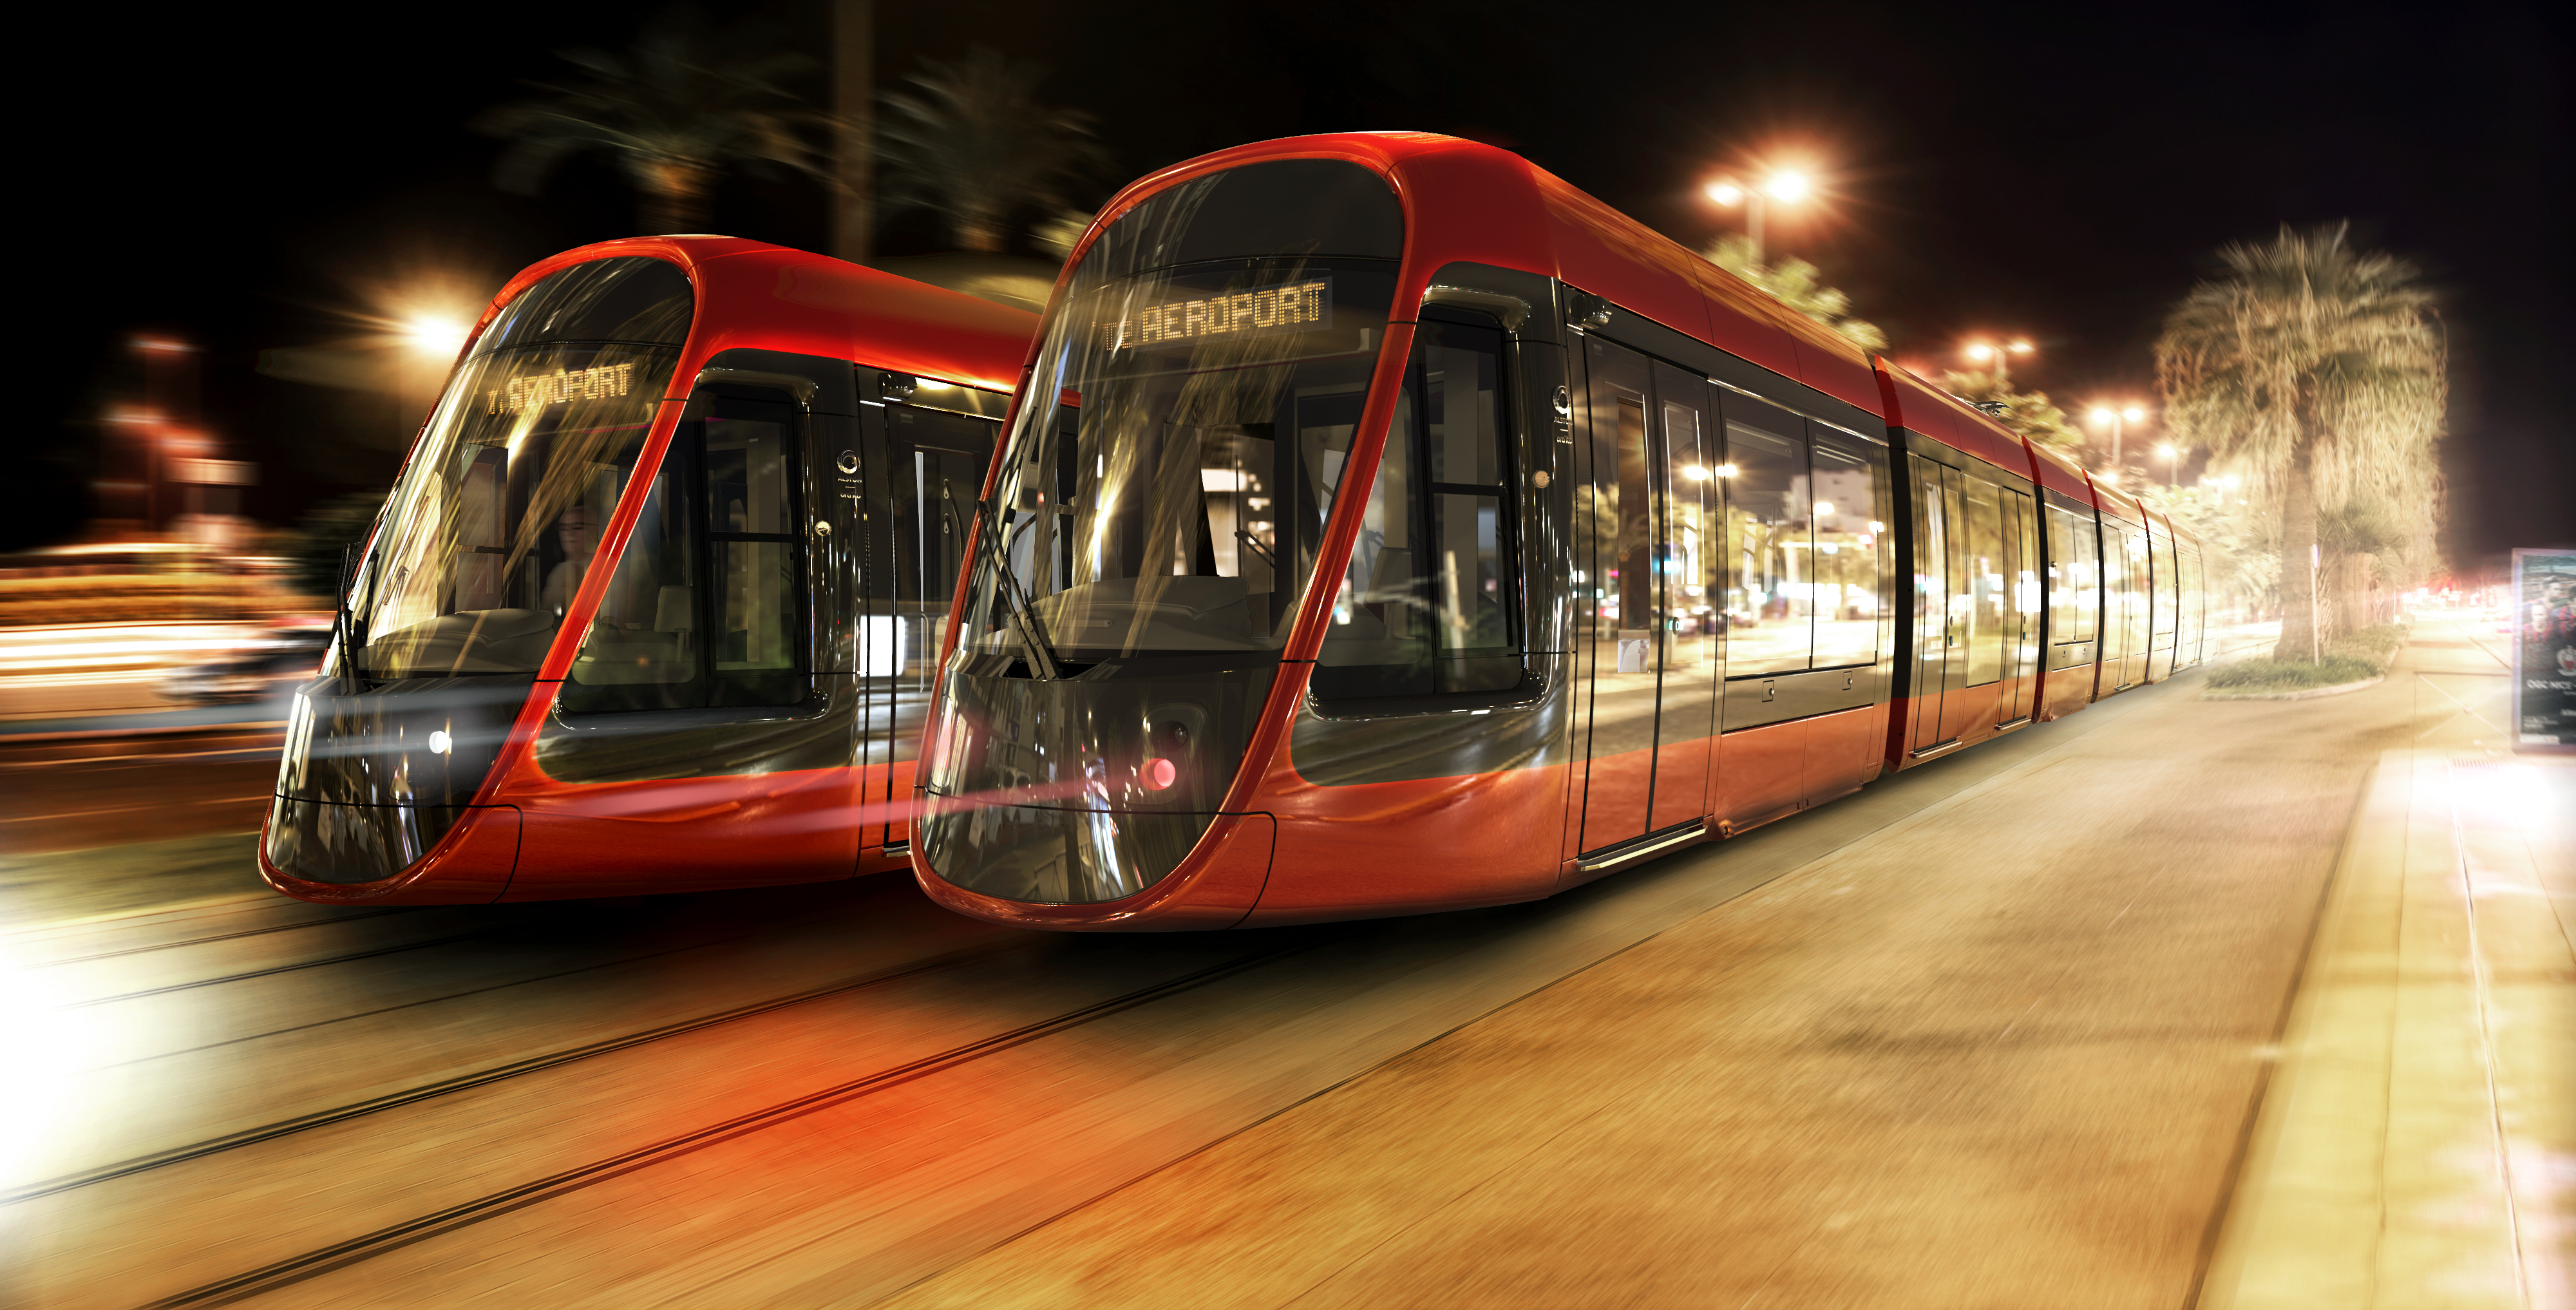 tramway t2 travaux. Black Bedroom Furniture Sets. Home Design Ideas